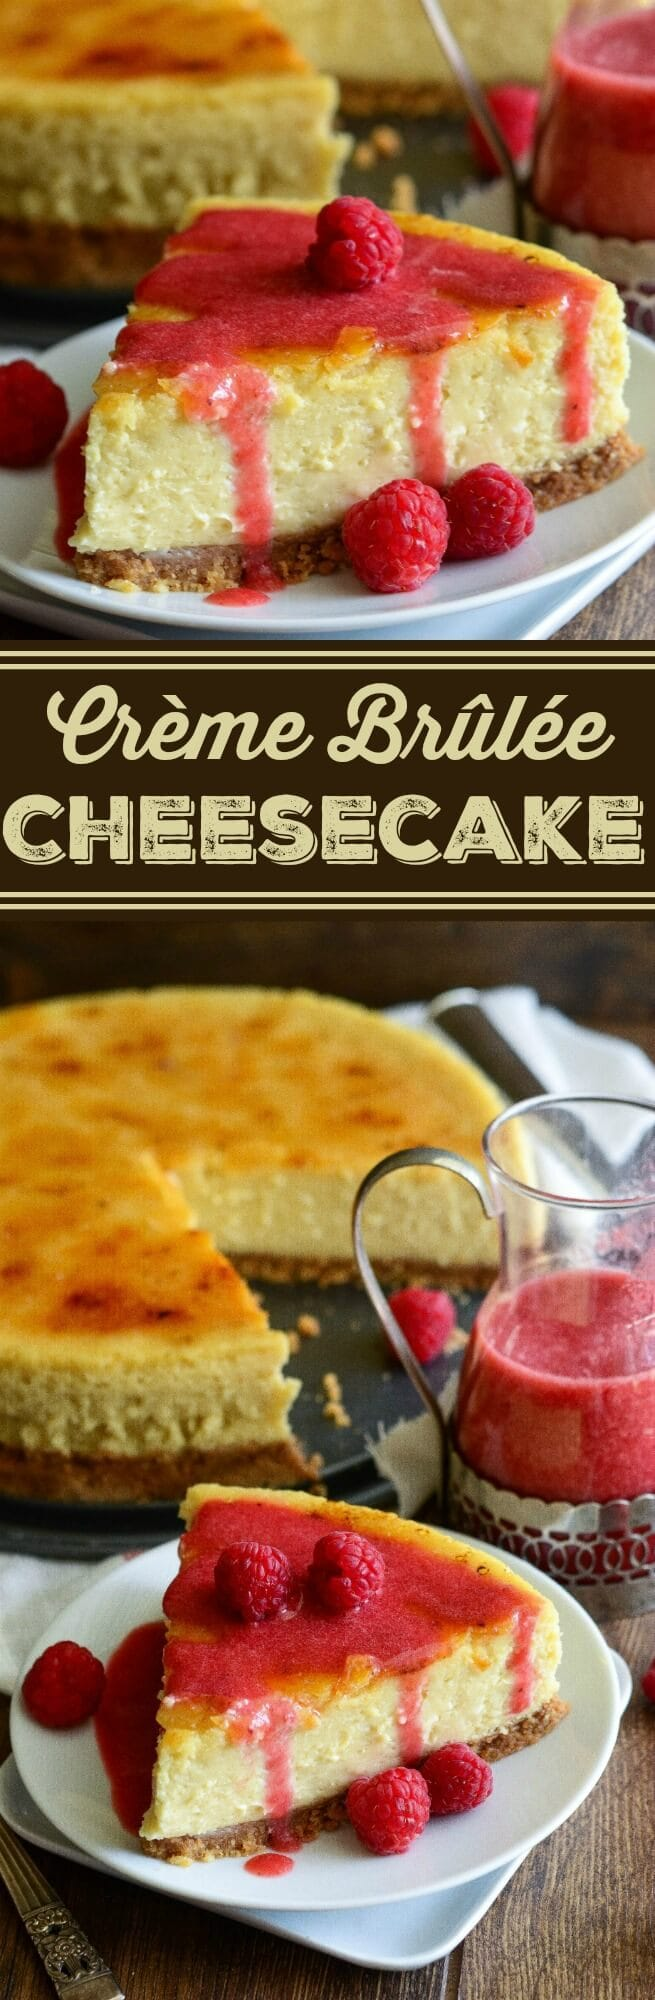 Crème Brûlée Cheesecake with Raspberry Sauce!